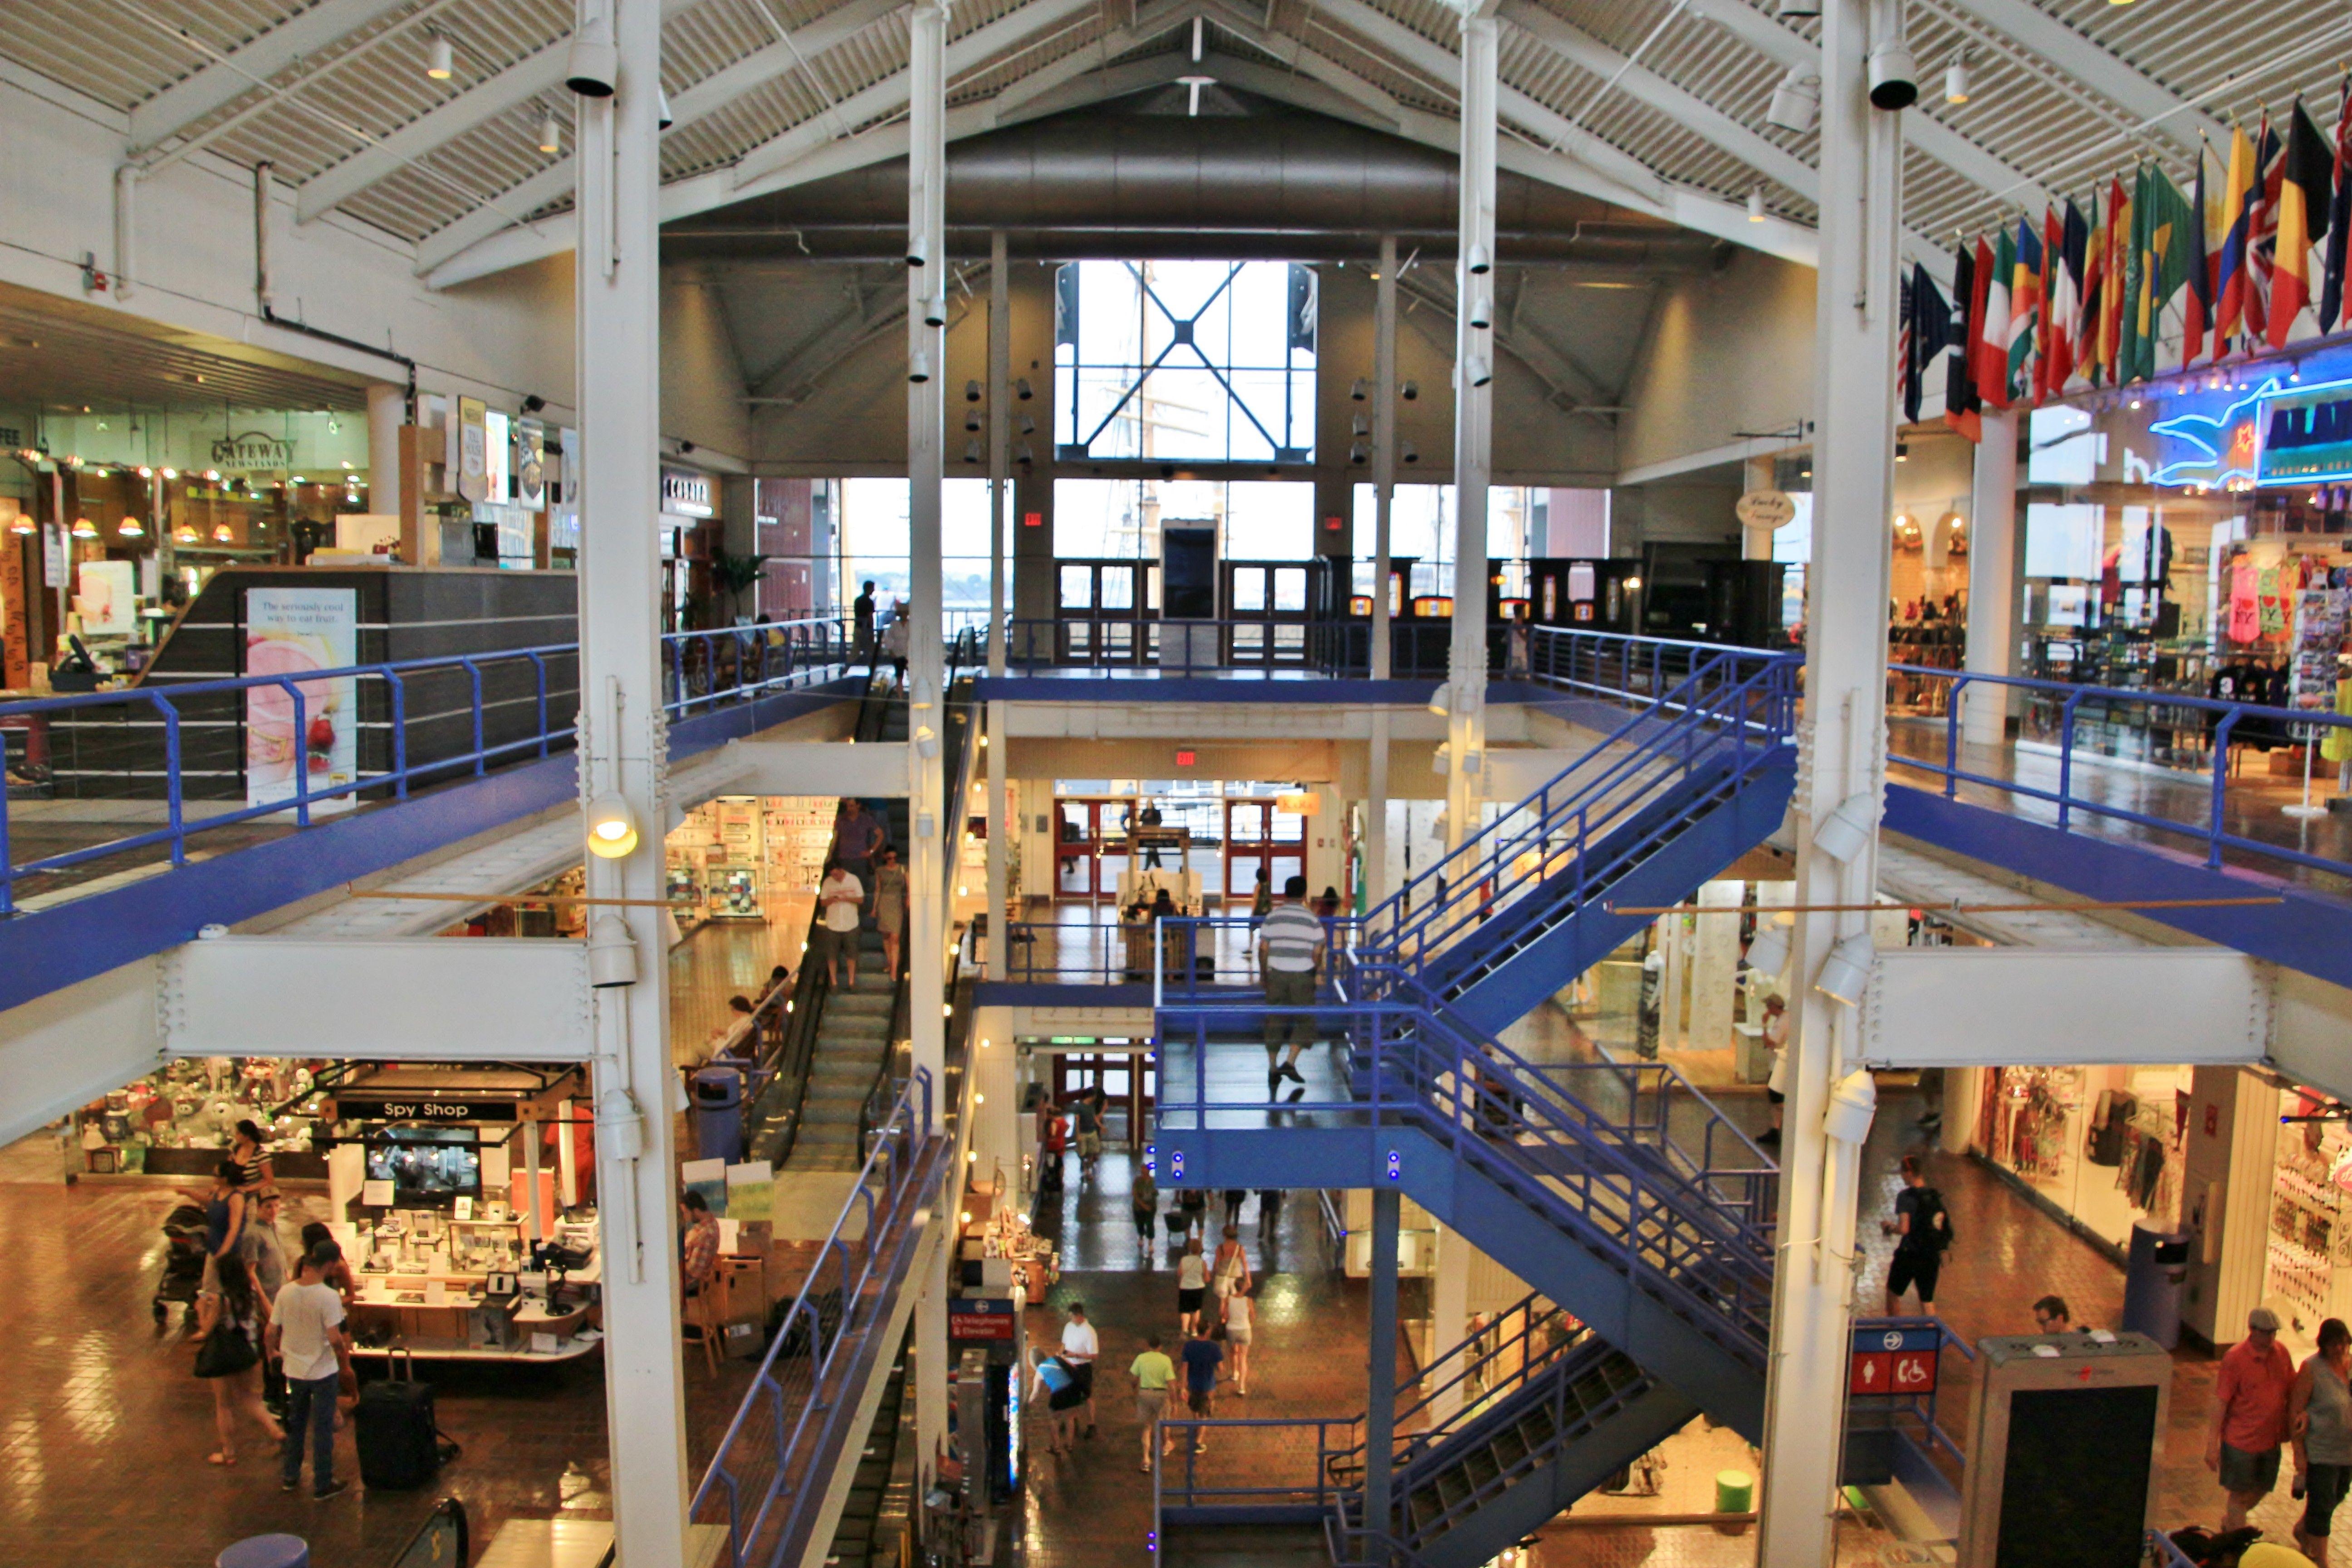 South Street Seaport Piet 17 Mall